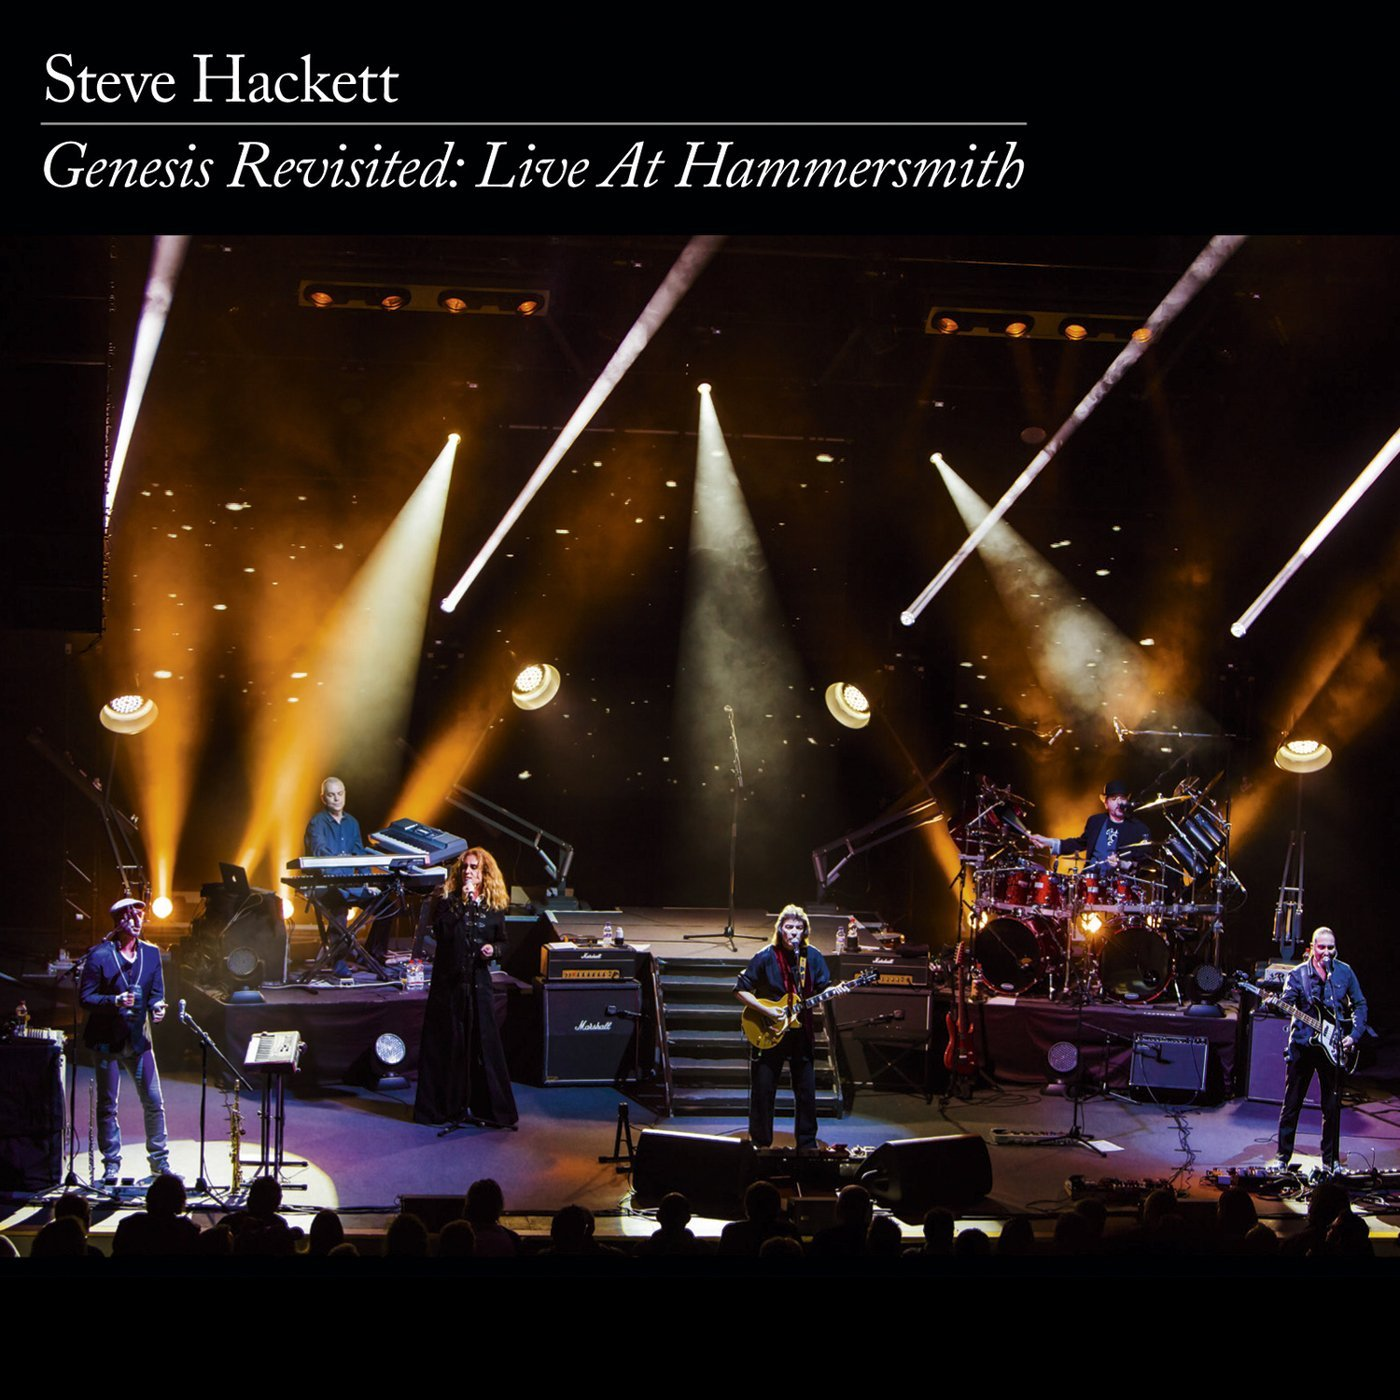 Steve Hackett- Genesis Revisited – Live at Hammersmith